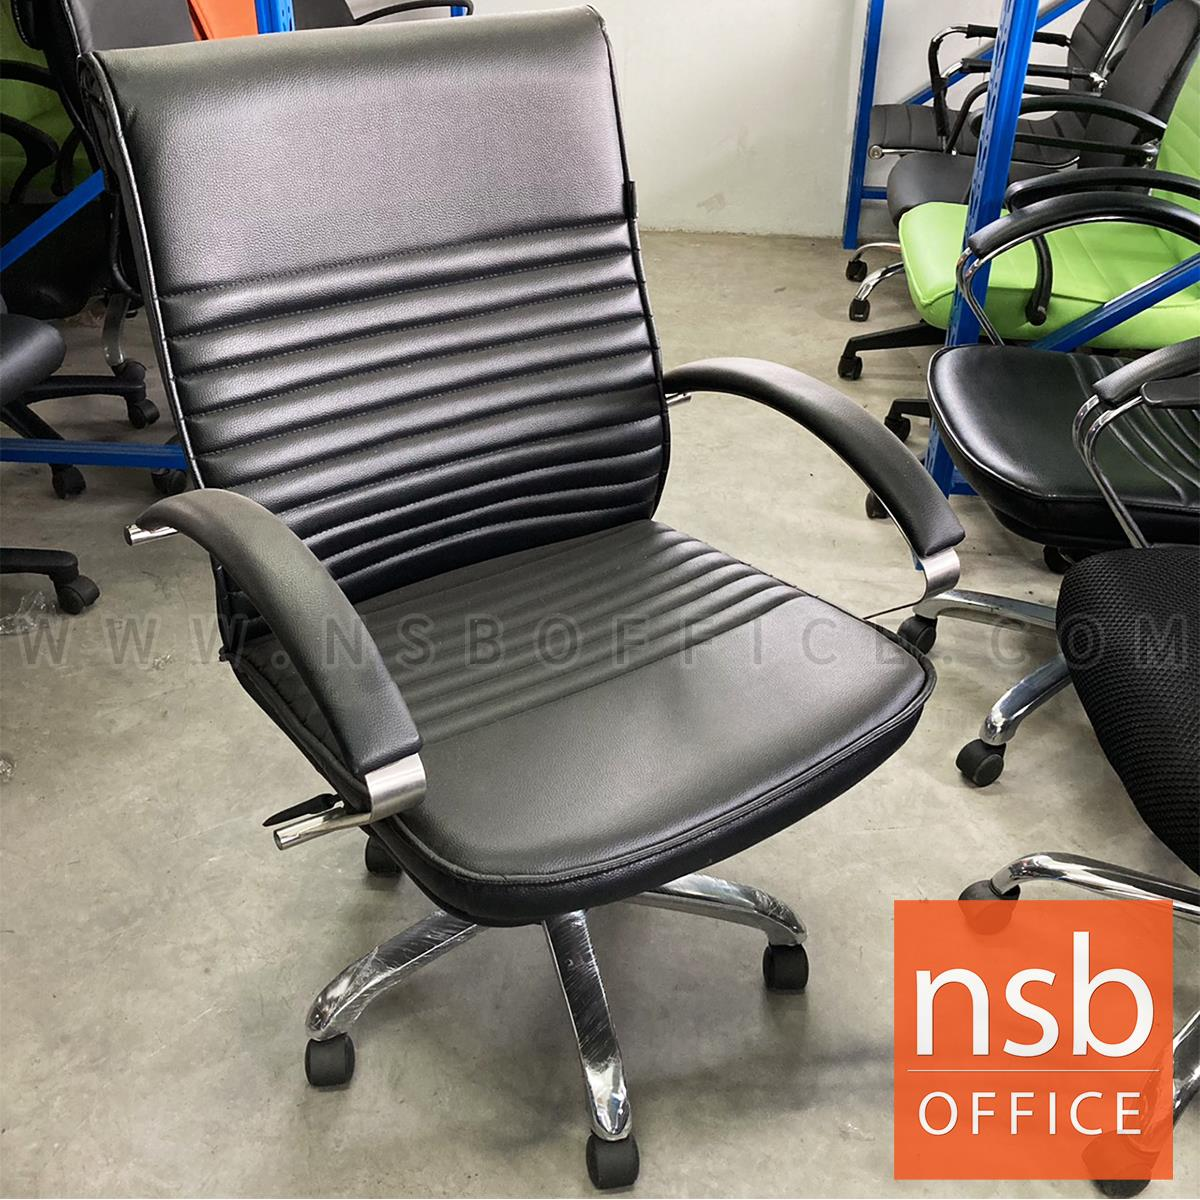 L02A373:เก้าอี้สำนักงาน   โช๊คแก๊ส ขาเหล็กชุบโครเมี่ยม